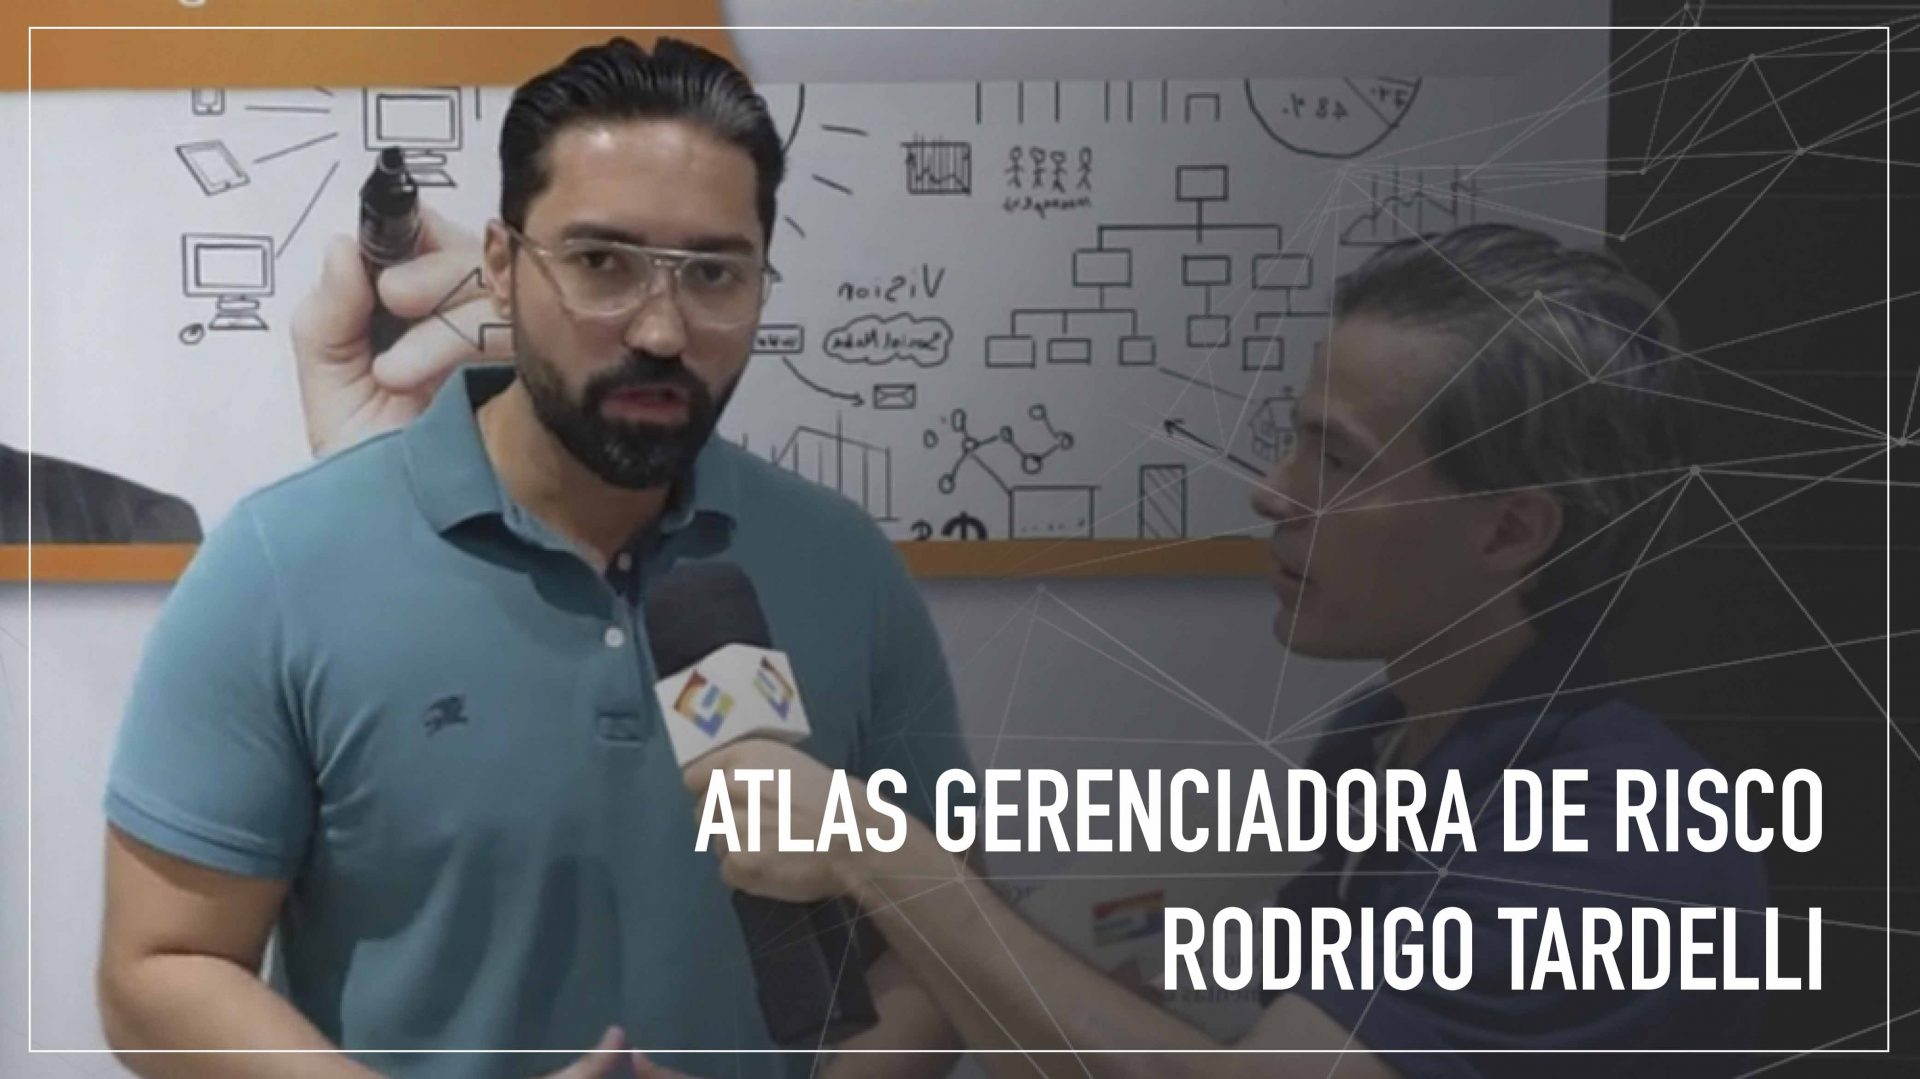 Rodrigo Tardelli – Atlas Gerenciadora de Risco